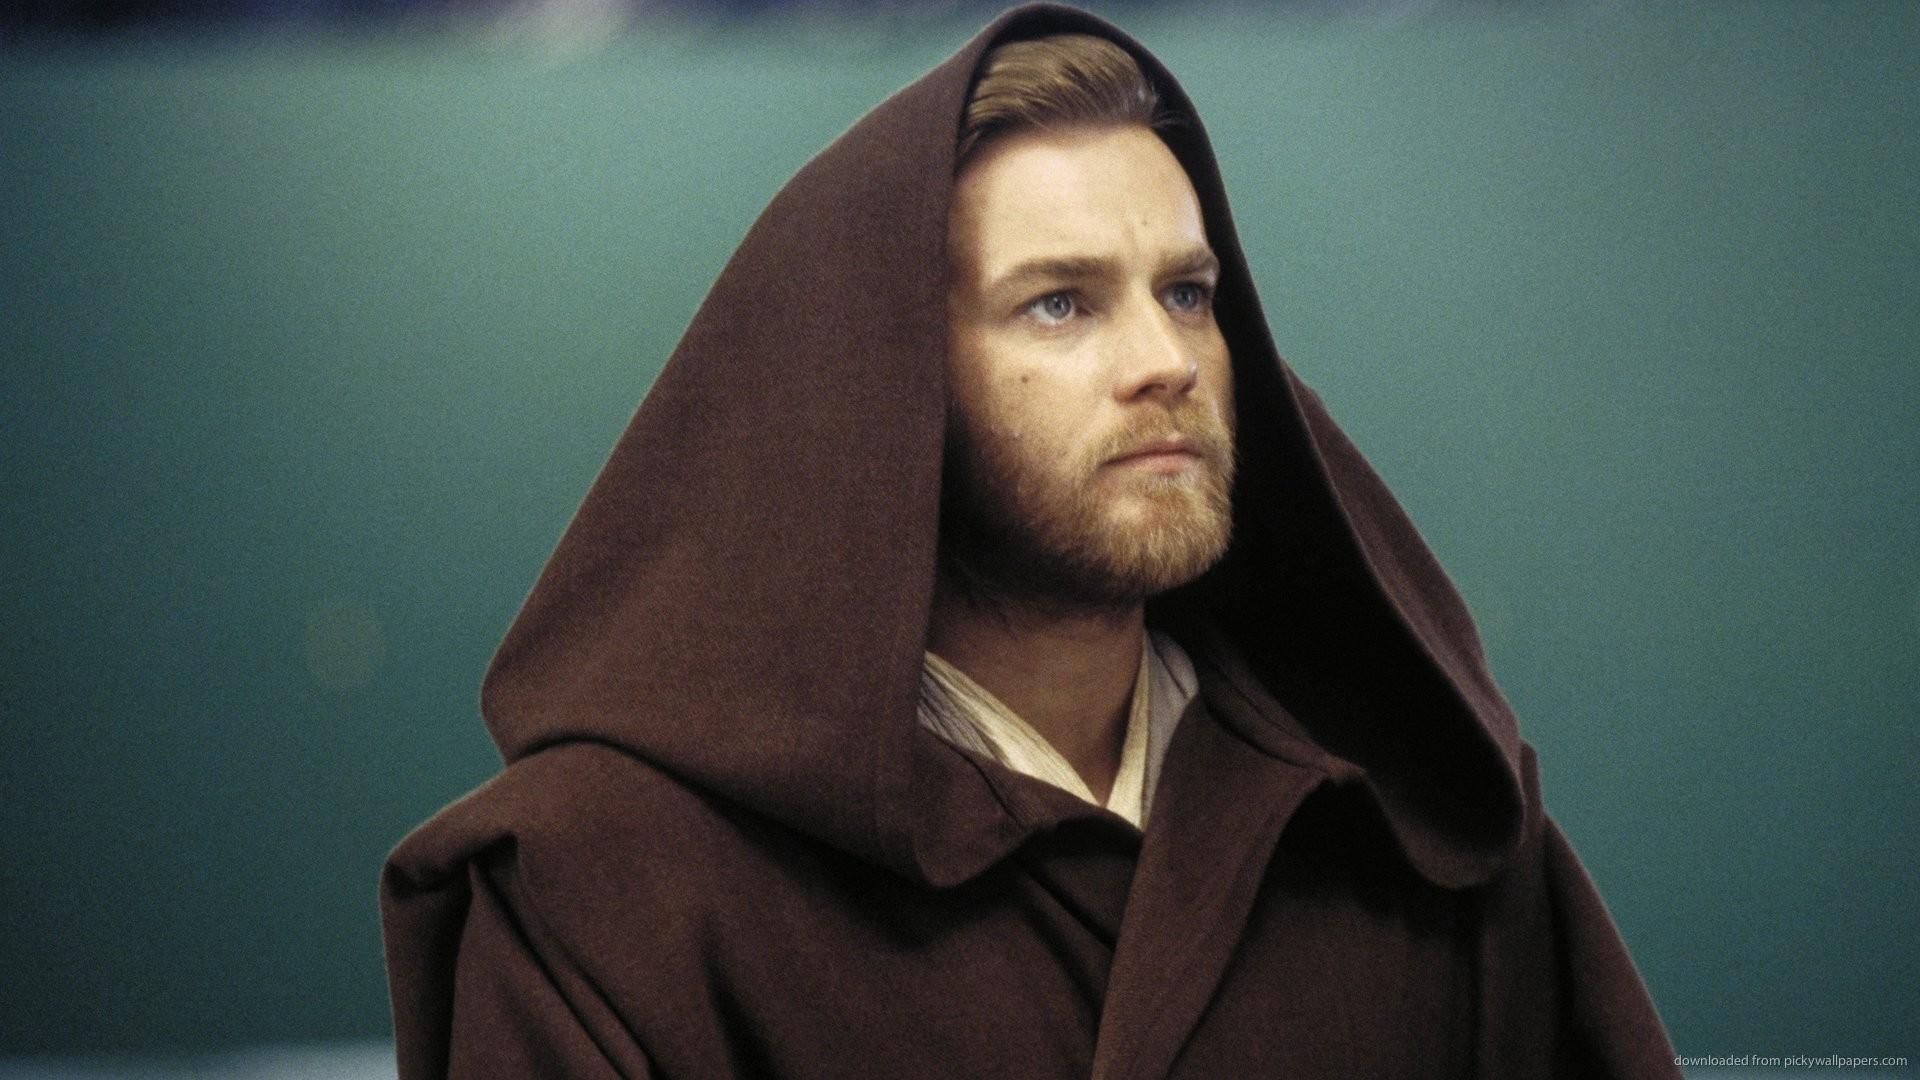 Young Obi-Wan Kenobi for 1920×1080